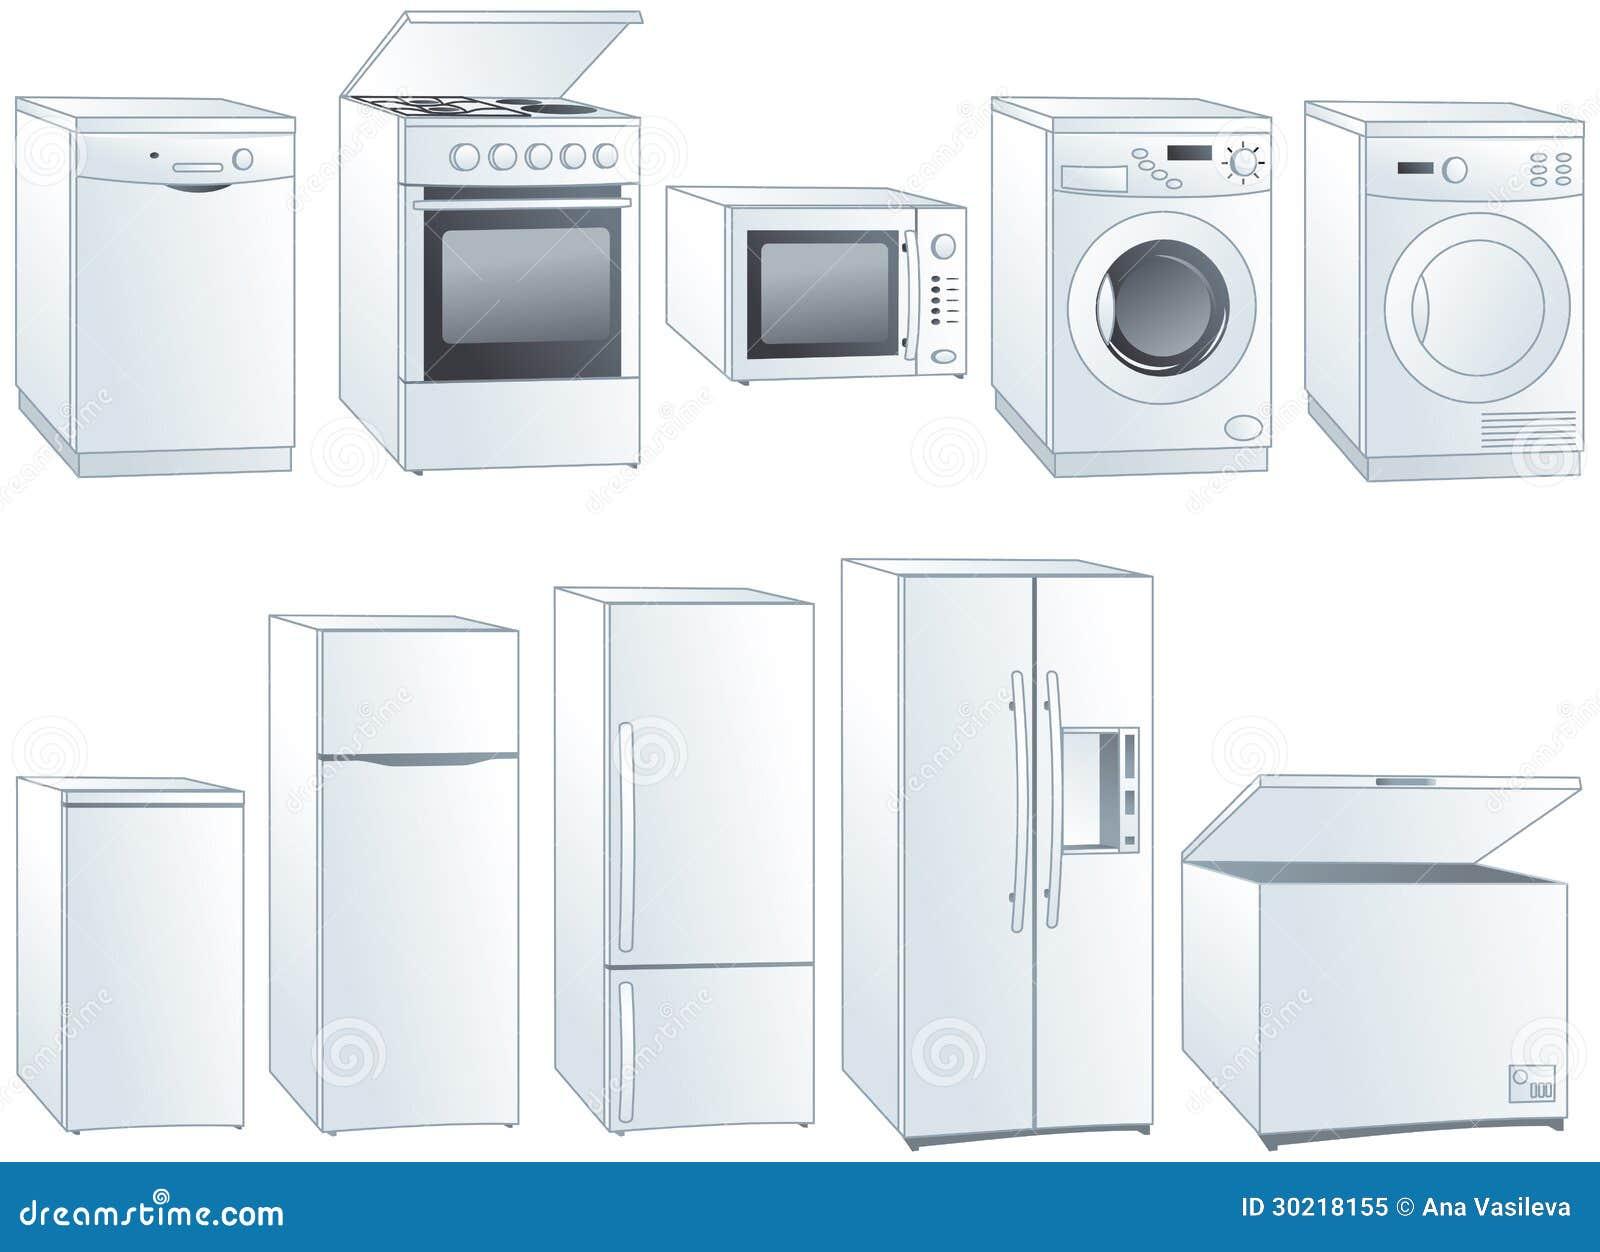 Home Appliances Illustrations Set Royalty Free Stock Photo